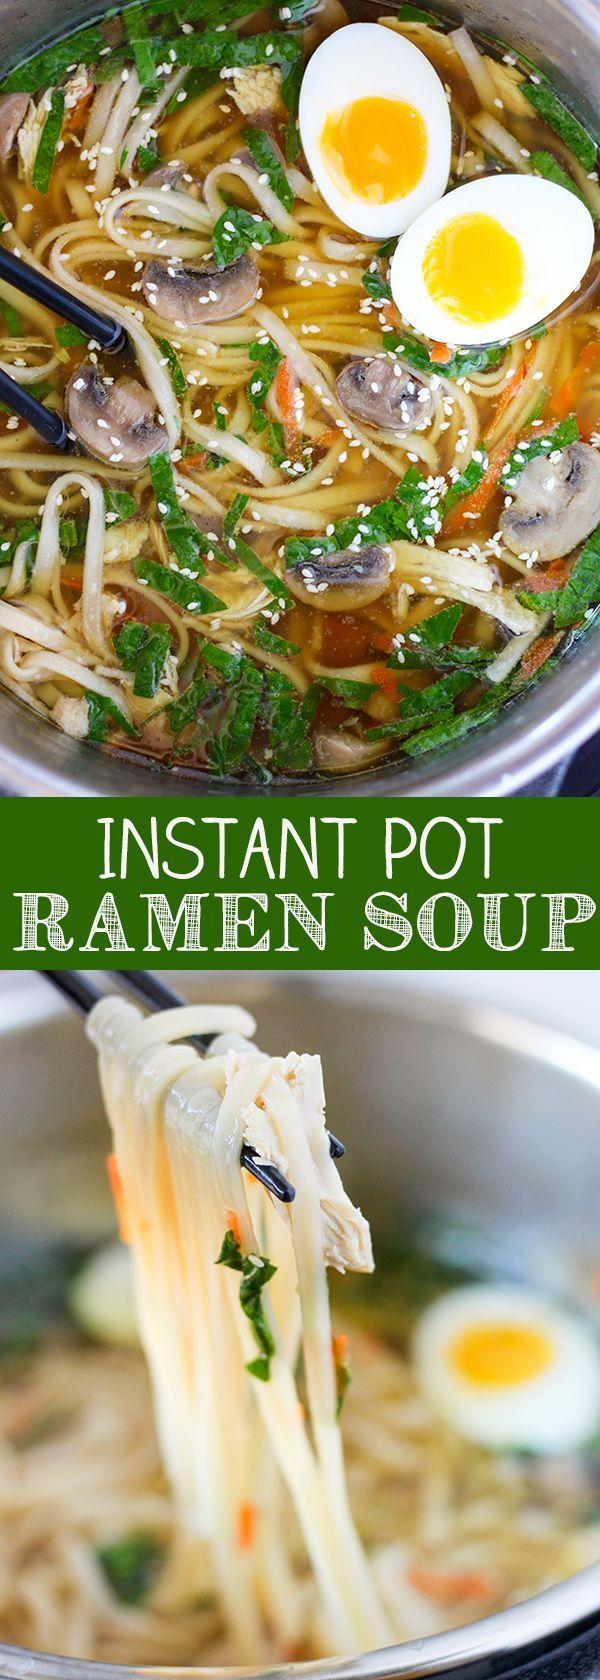 17 best ideas about ramen soup on pinterest easy ramen for Instant pot fish recipes